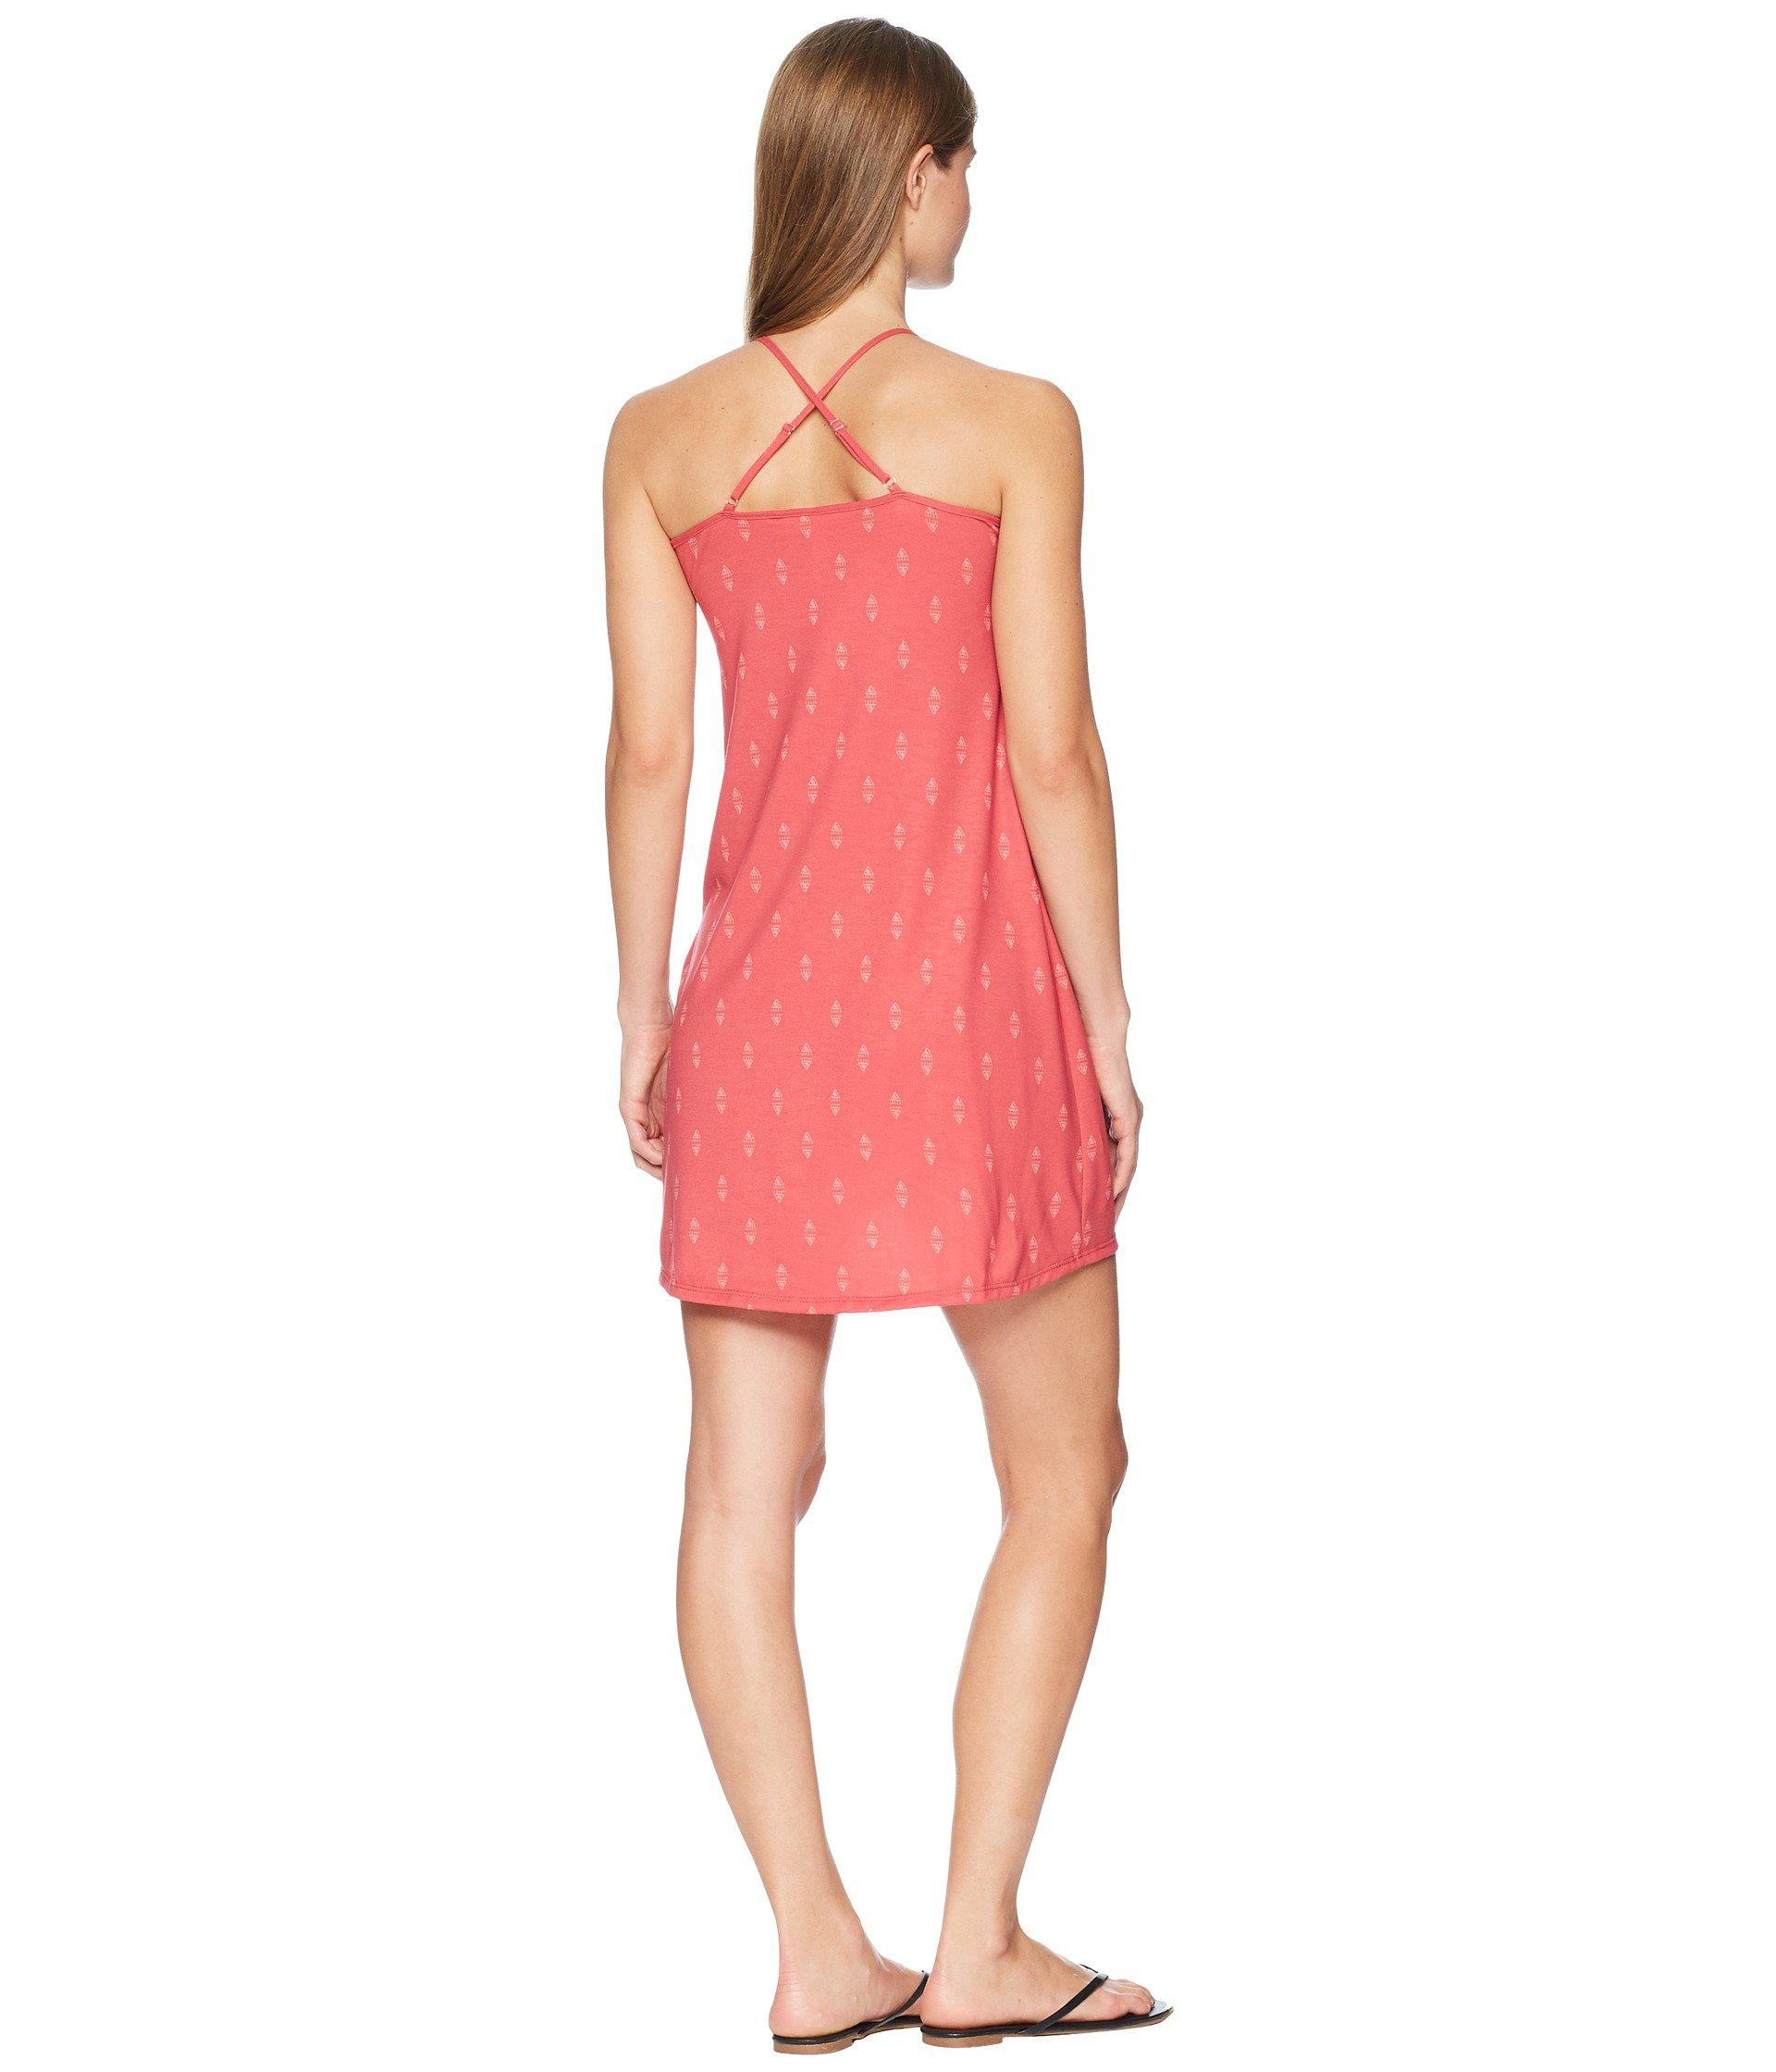 FIG Womens Pop dress